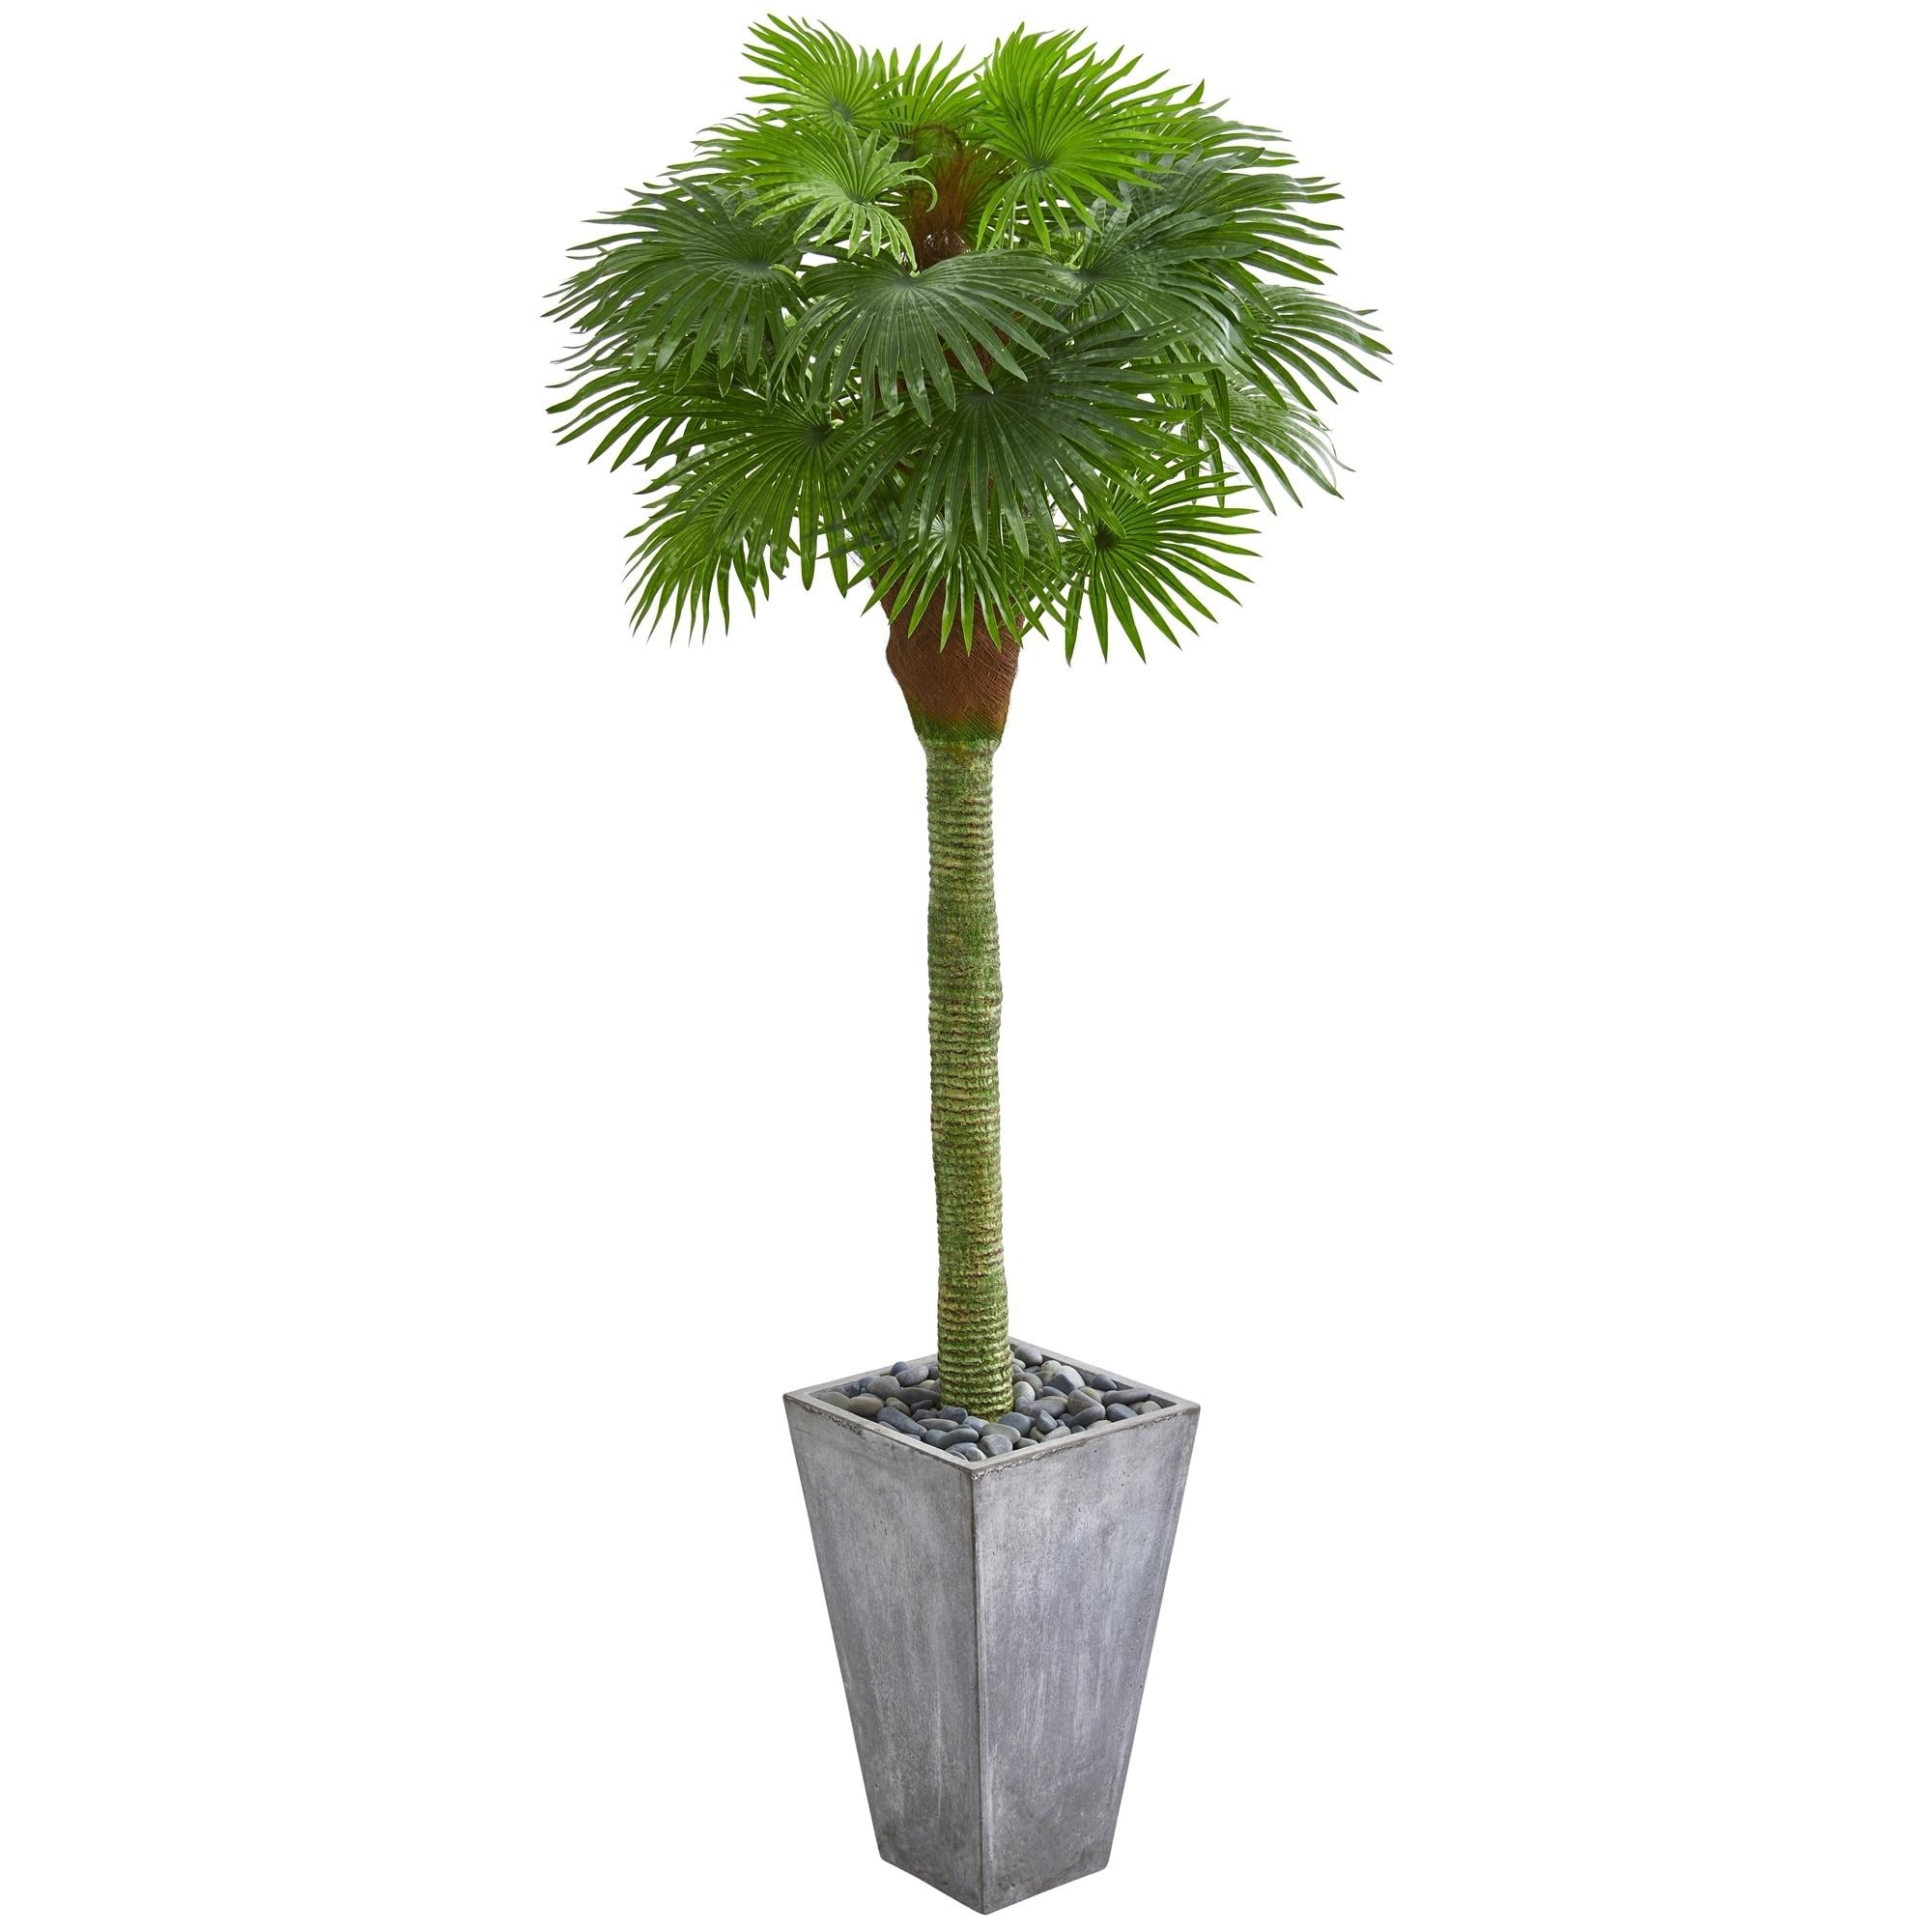 6.5 Fan Palm Artificial Tree in Cement Planter UV Resistant (Indoor/Outdoor)